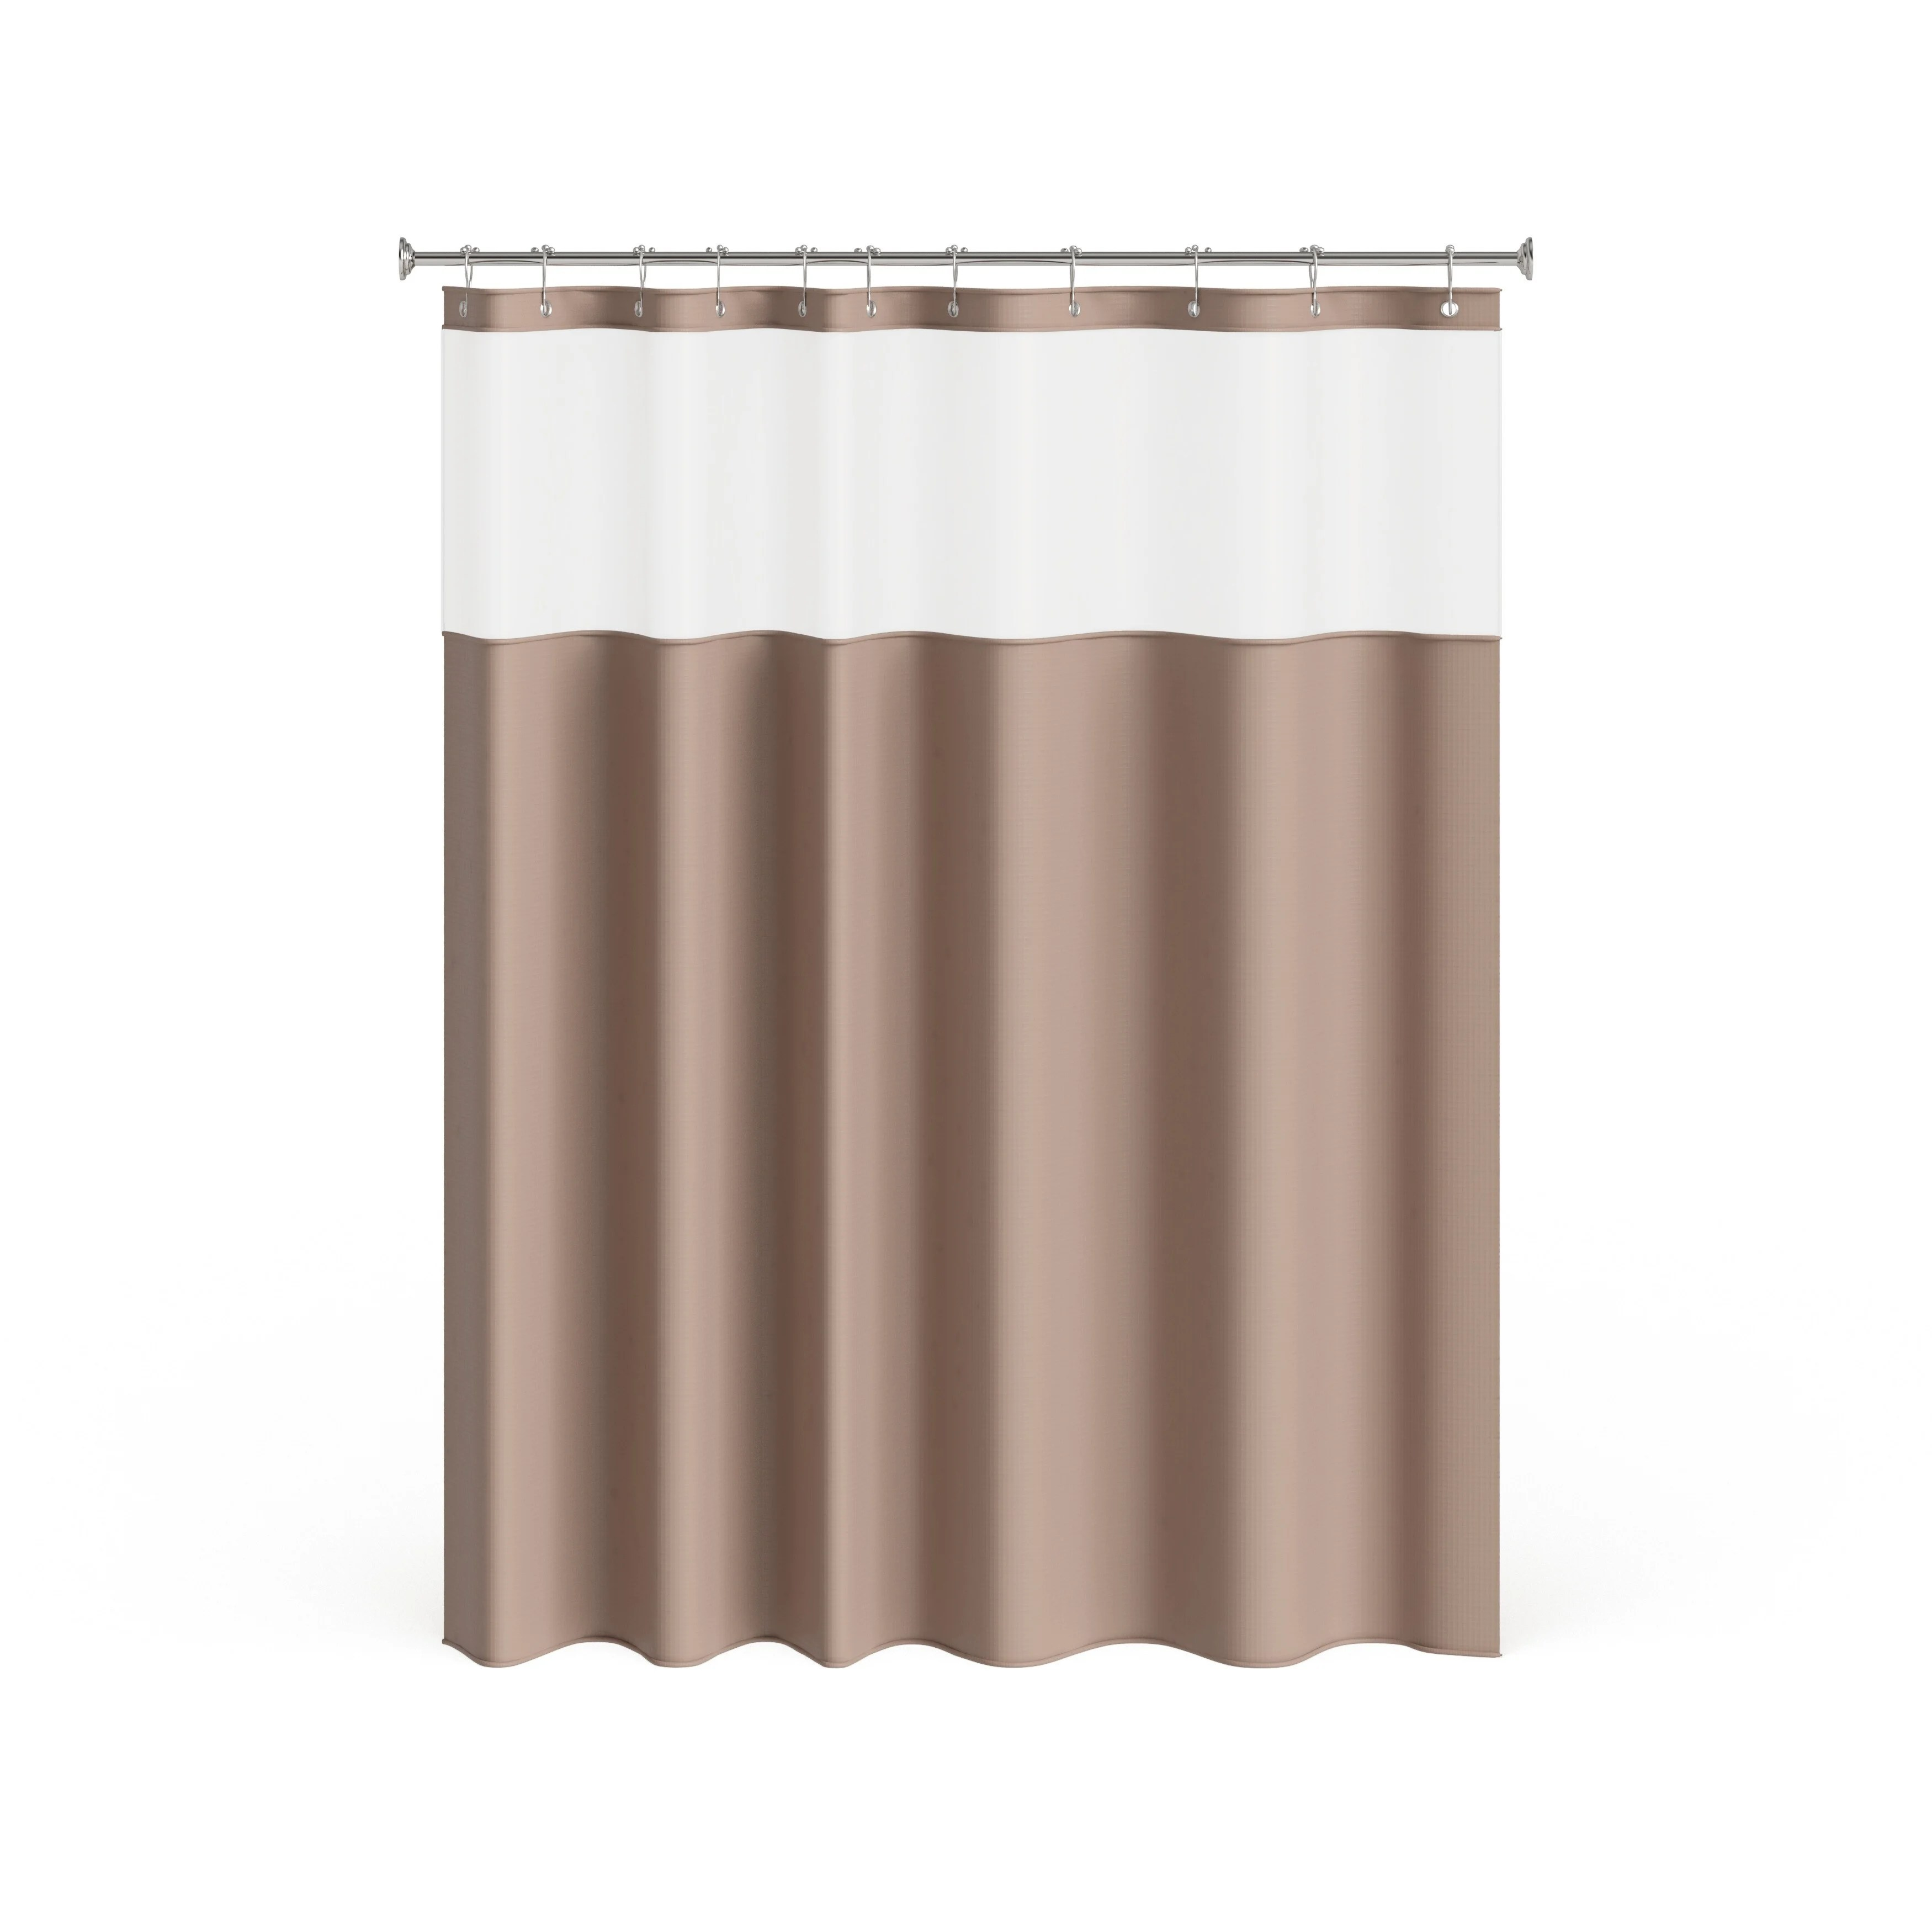 porch den roycroft hotel shower curtain with detachable liner